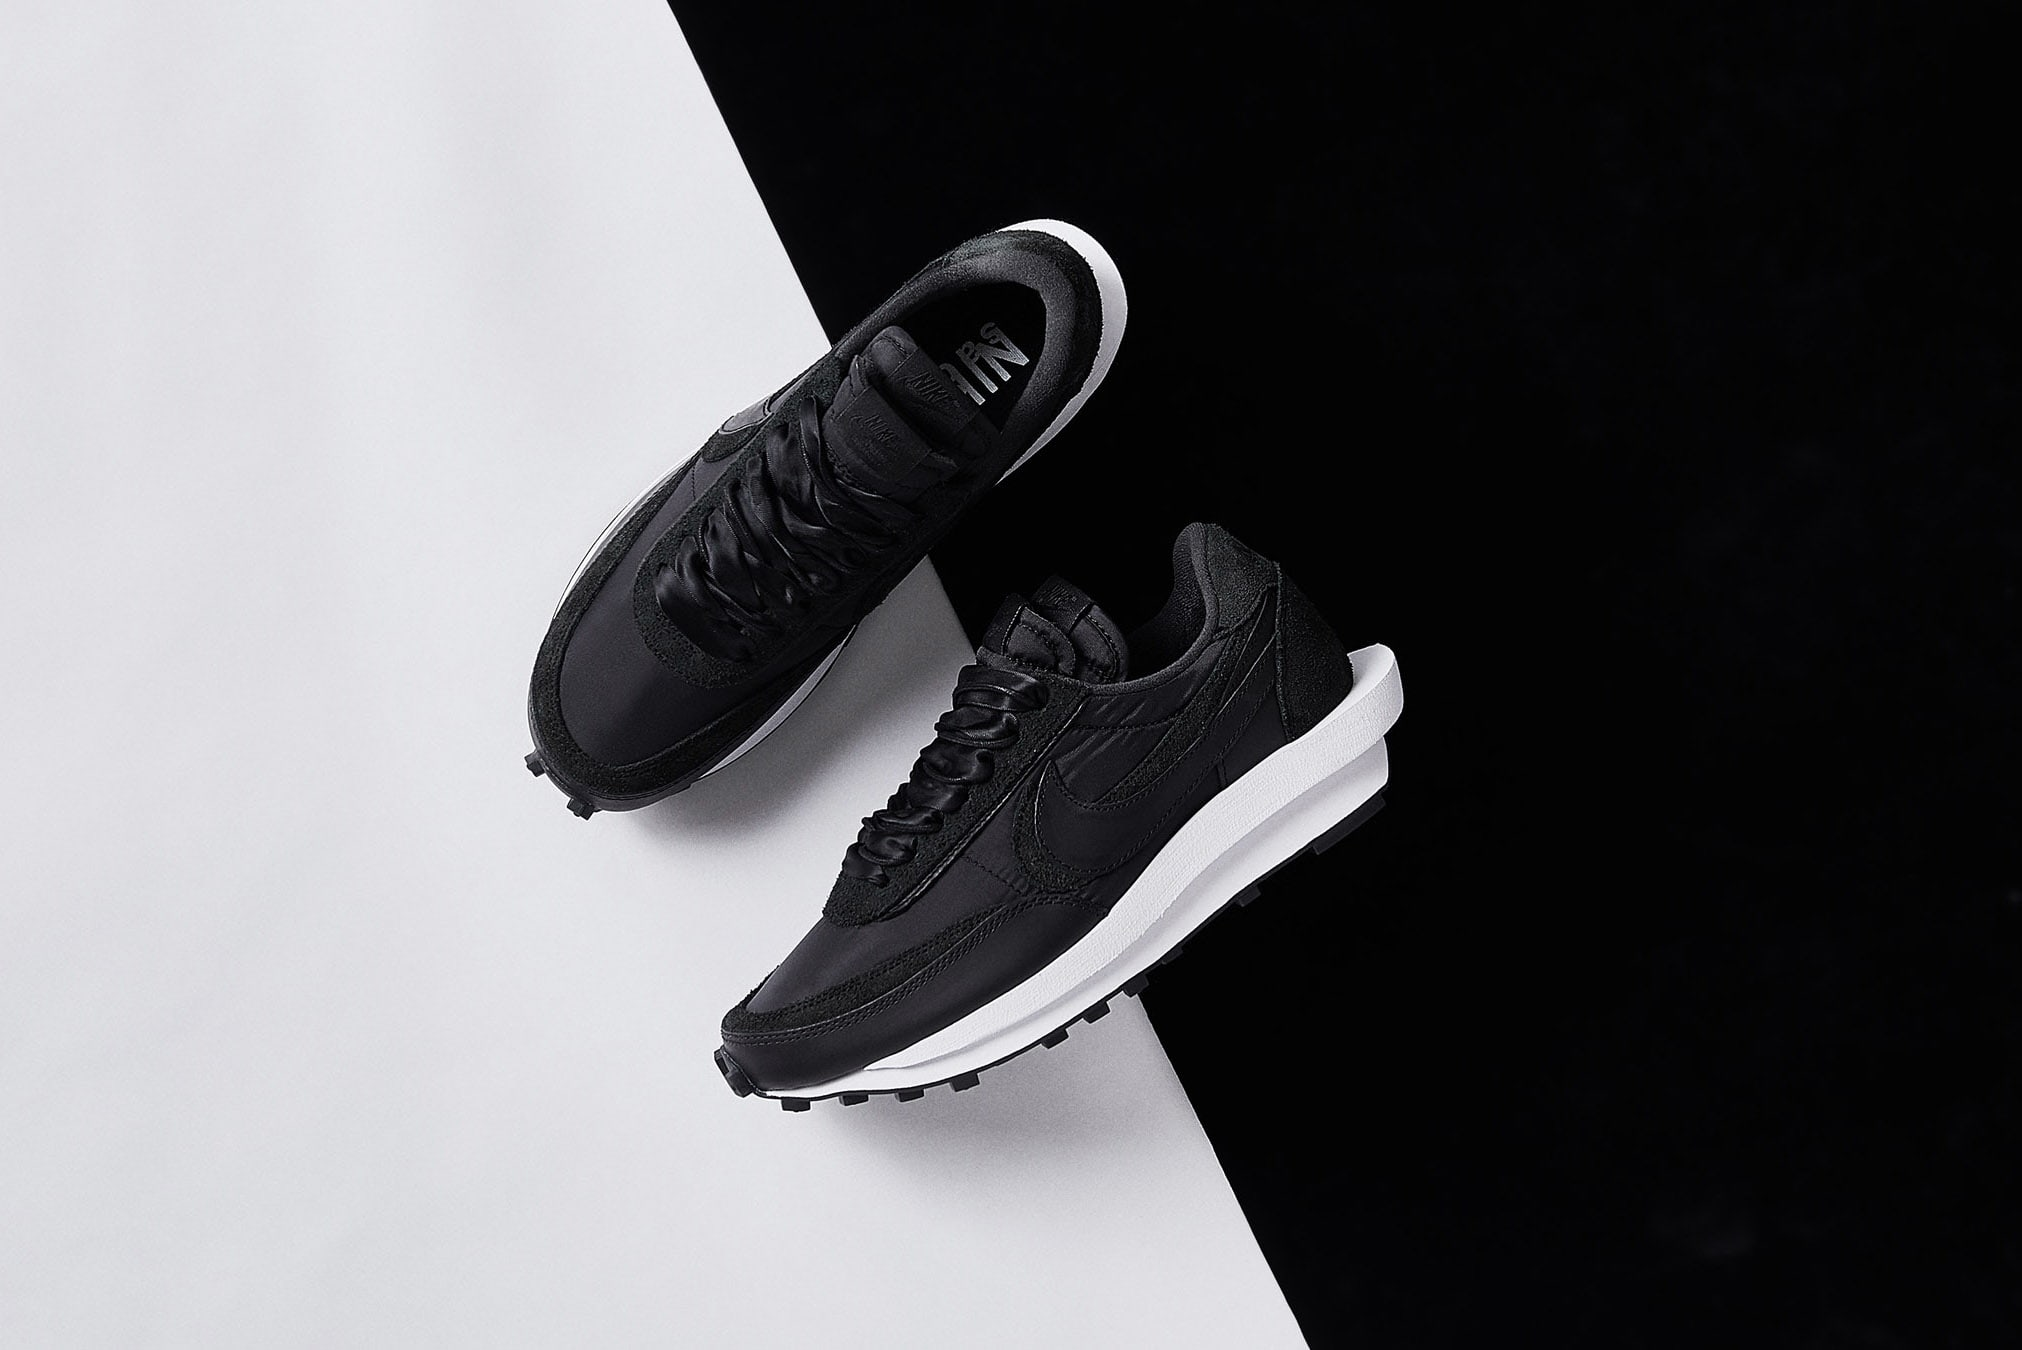 Nike x Sacai LDWaffle - BV0073-002